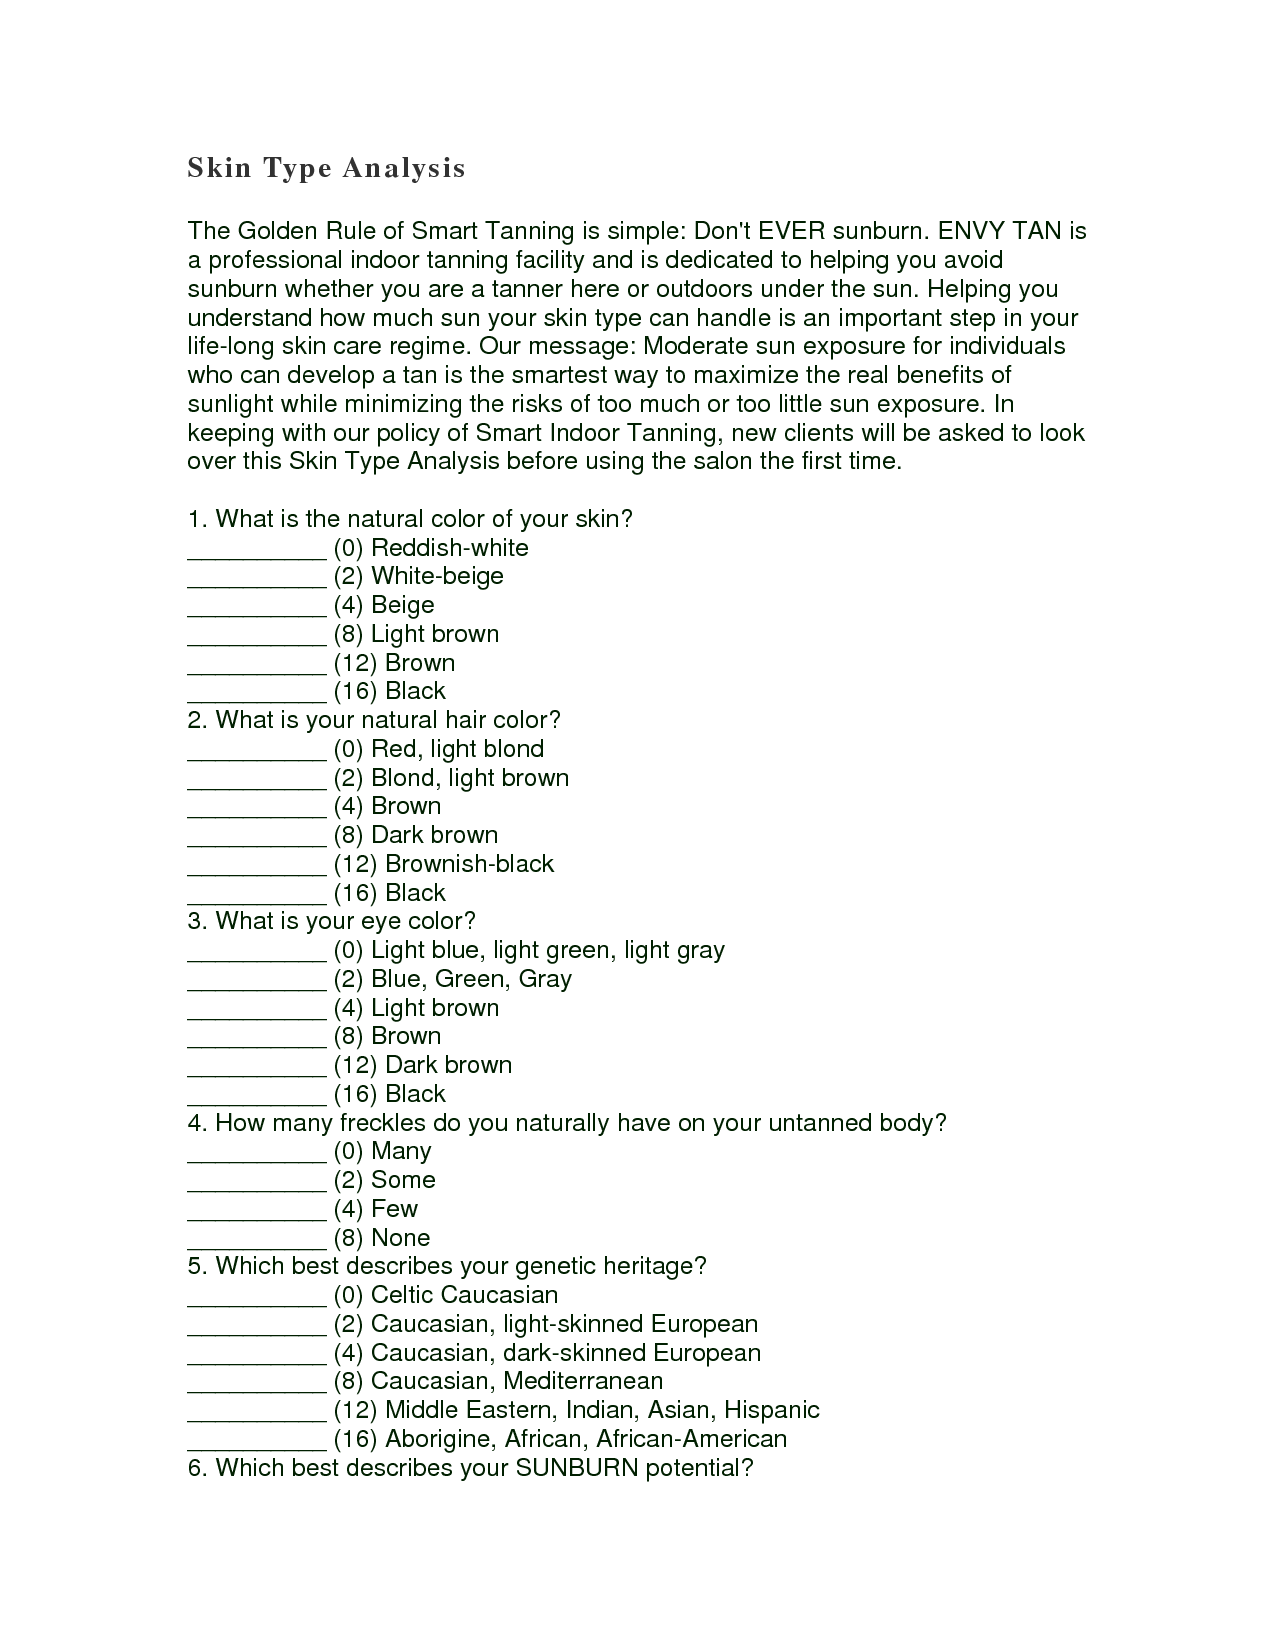 Fitzpatrick Skin Type Worksheet